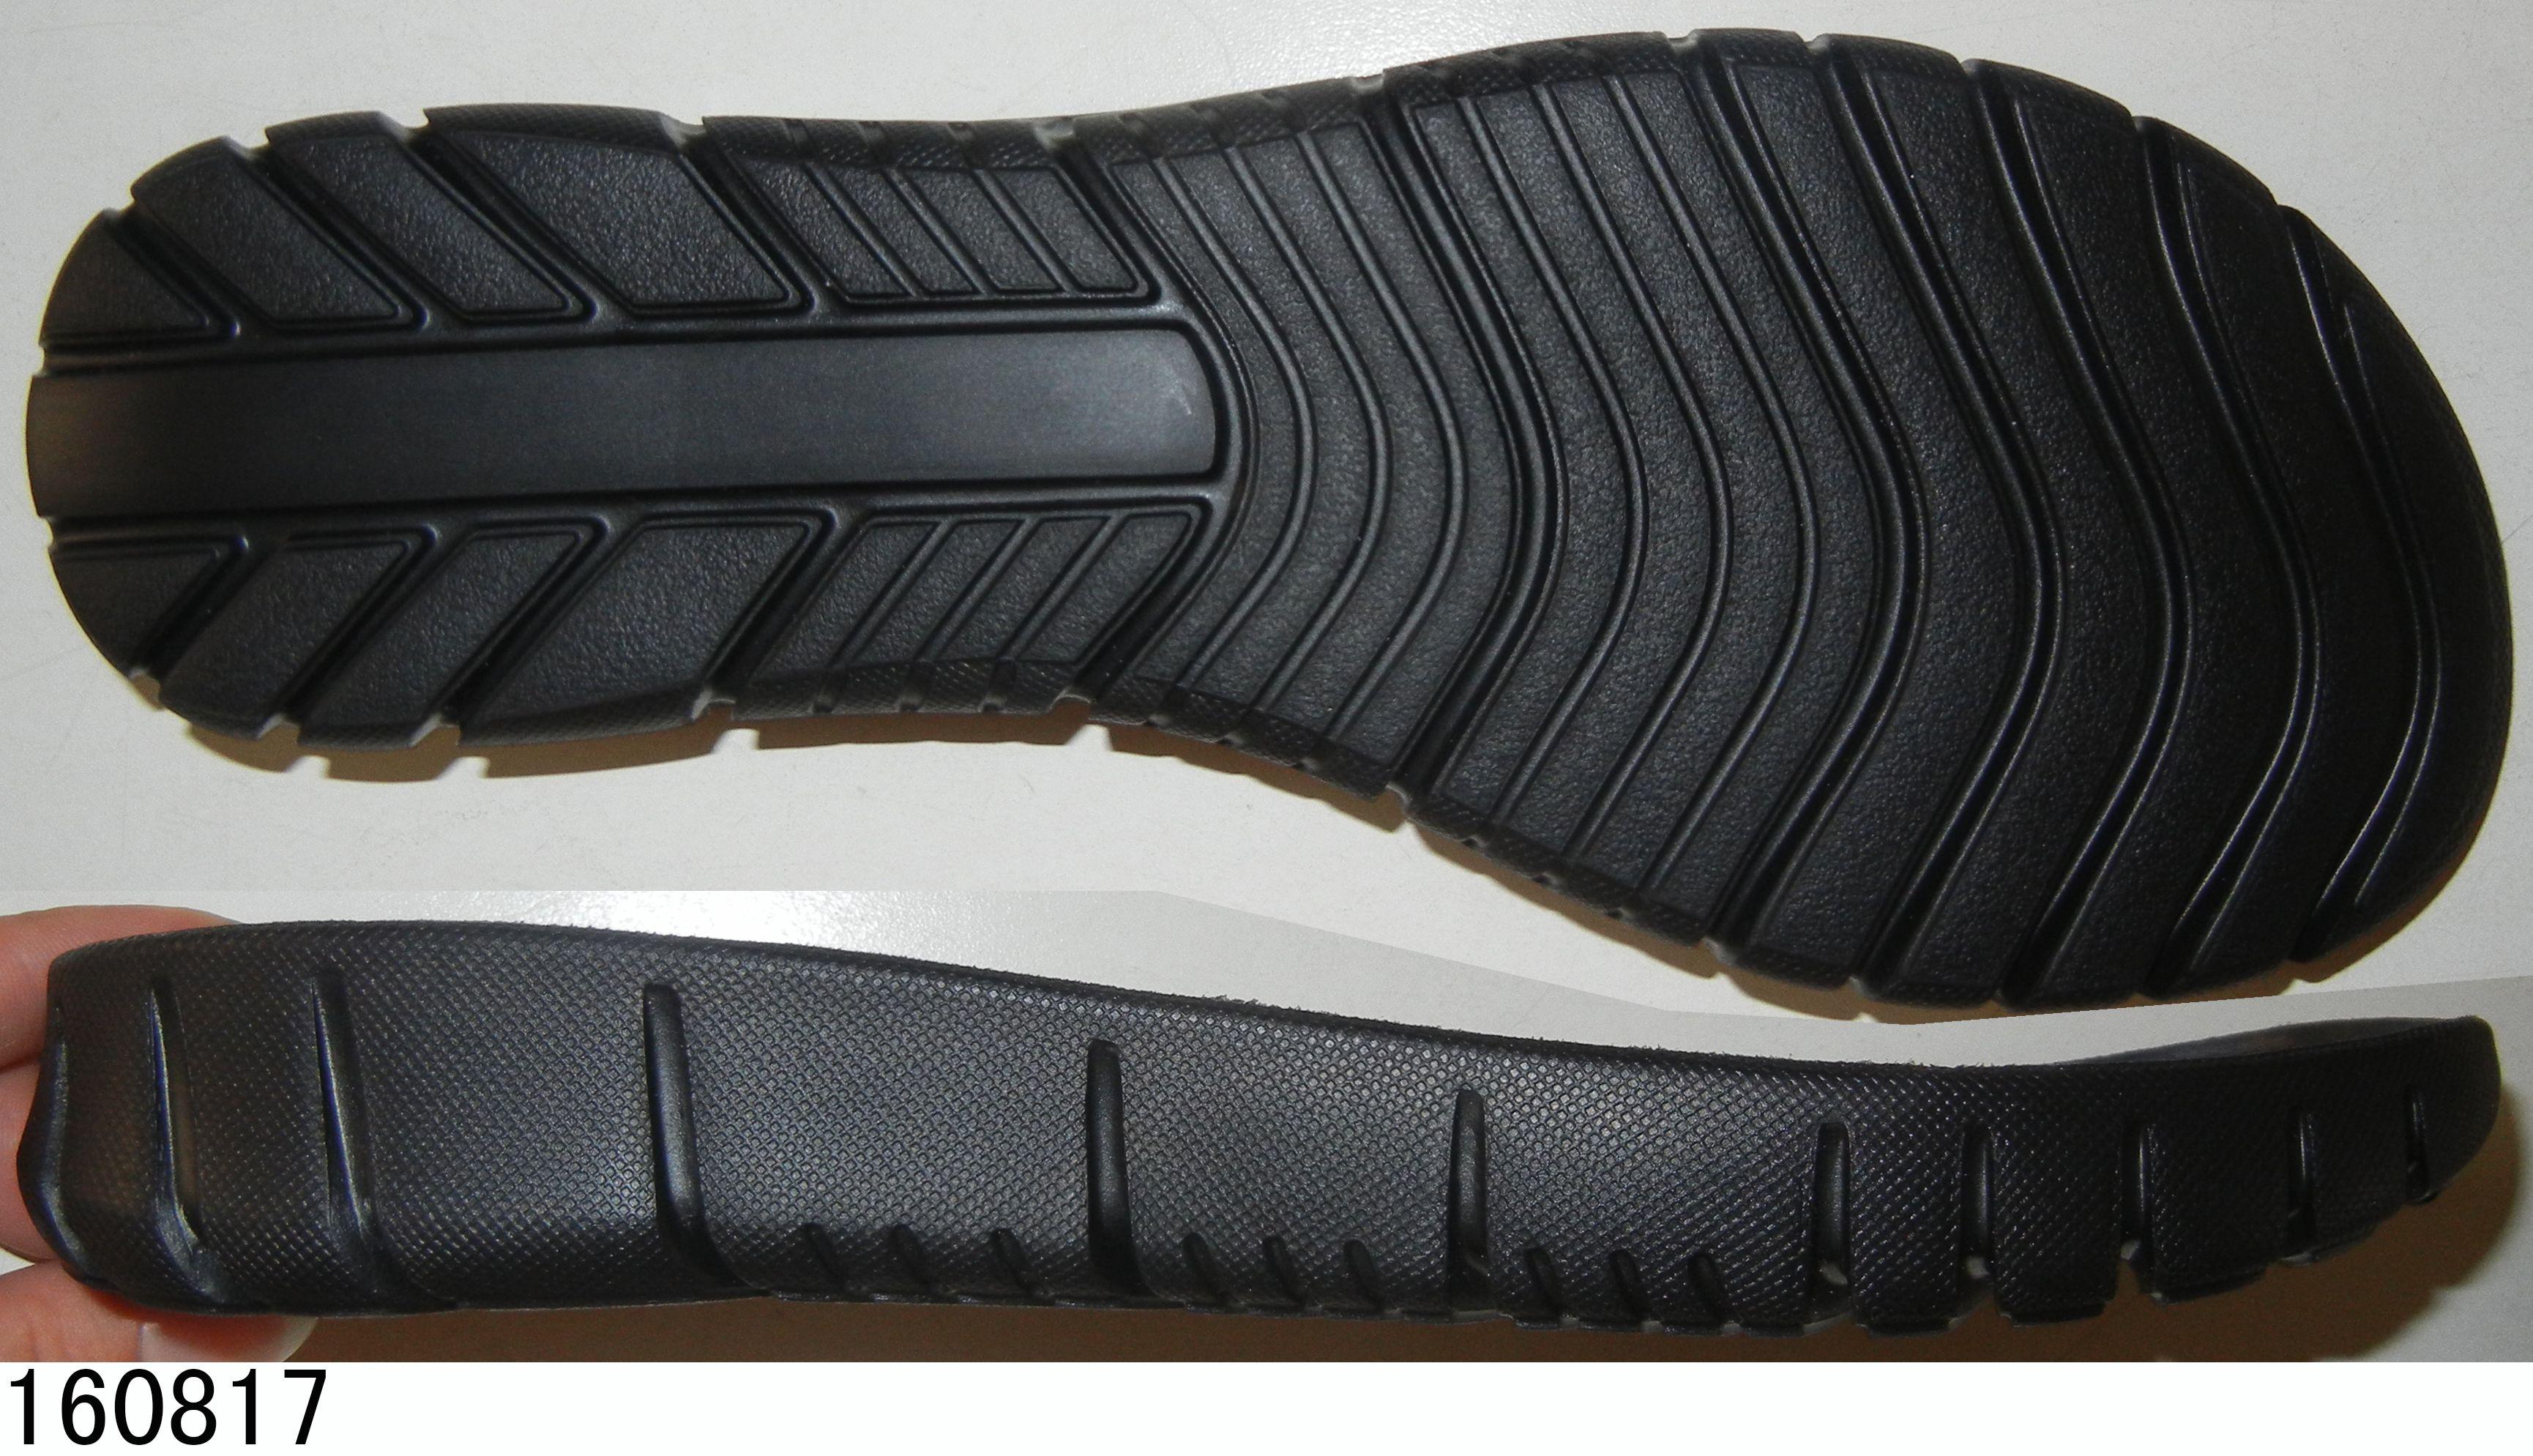 Rubber Sheet Shoe Sole Manufacturer Rubber Shoes Black Sports Shoes High Quality Shoes